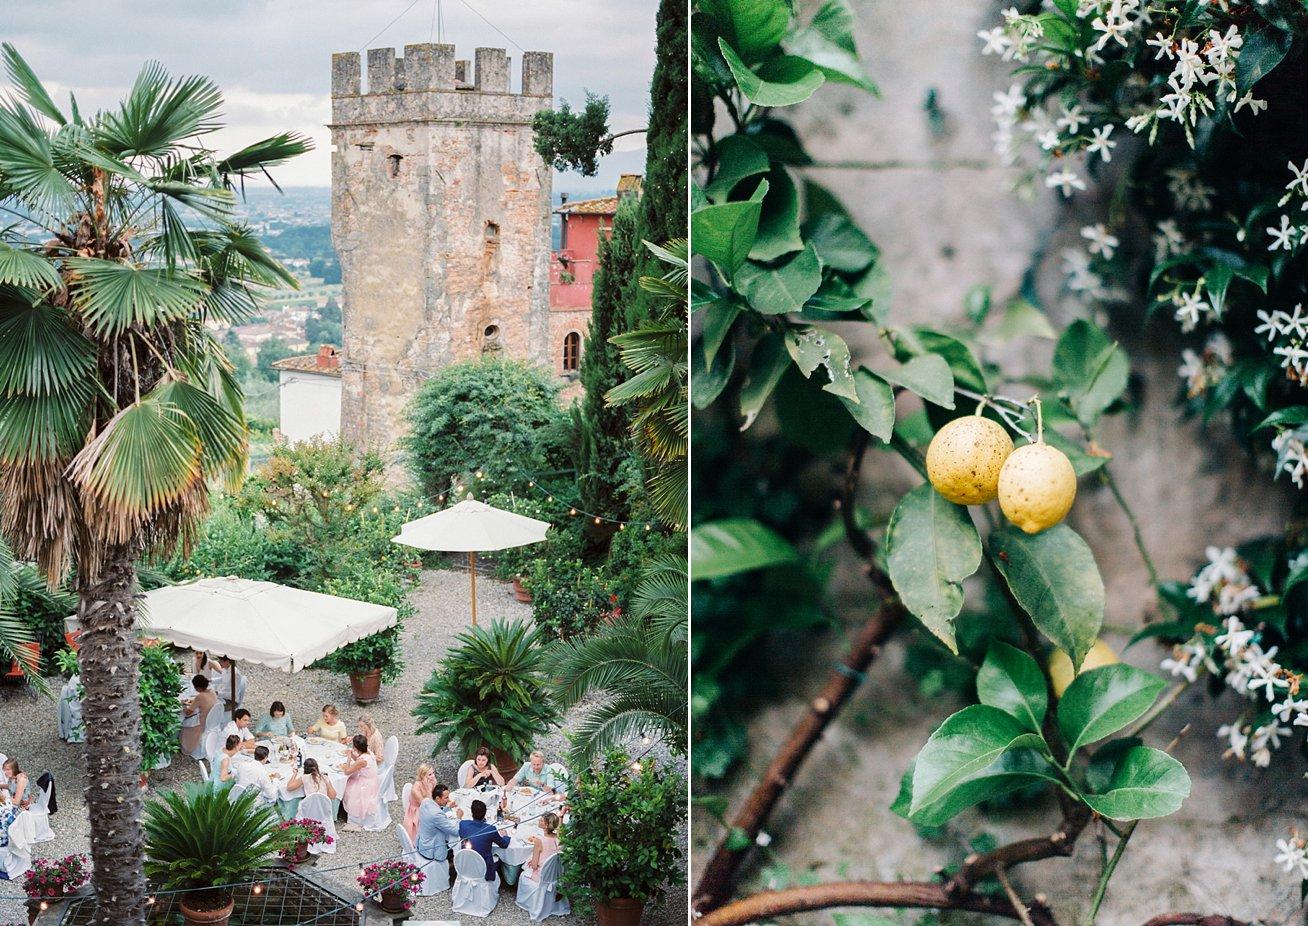 Amanda-Drost-photography-wedding-italy-Villa-sermolli-tuscany_0037.jpg